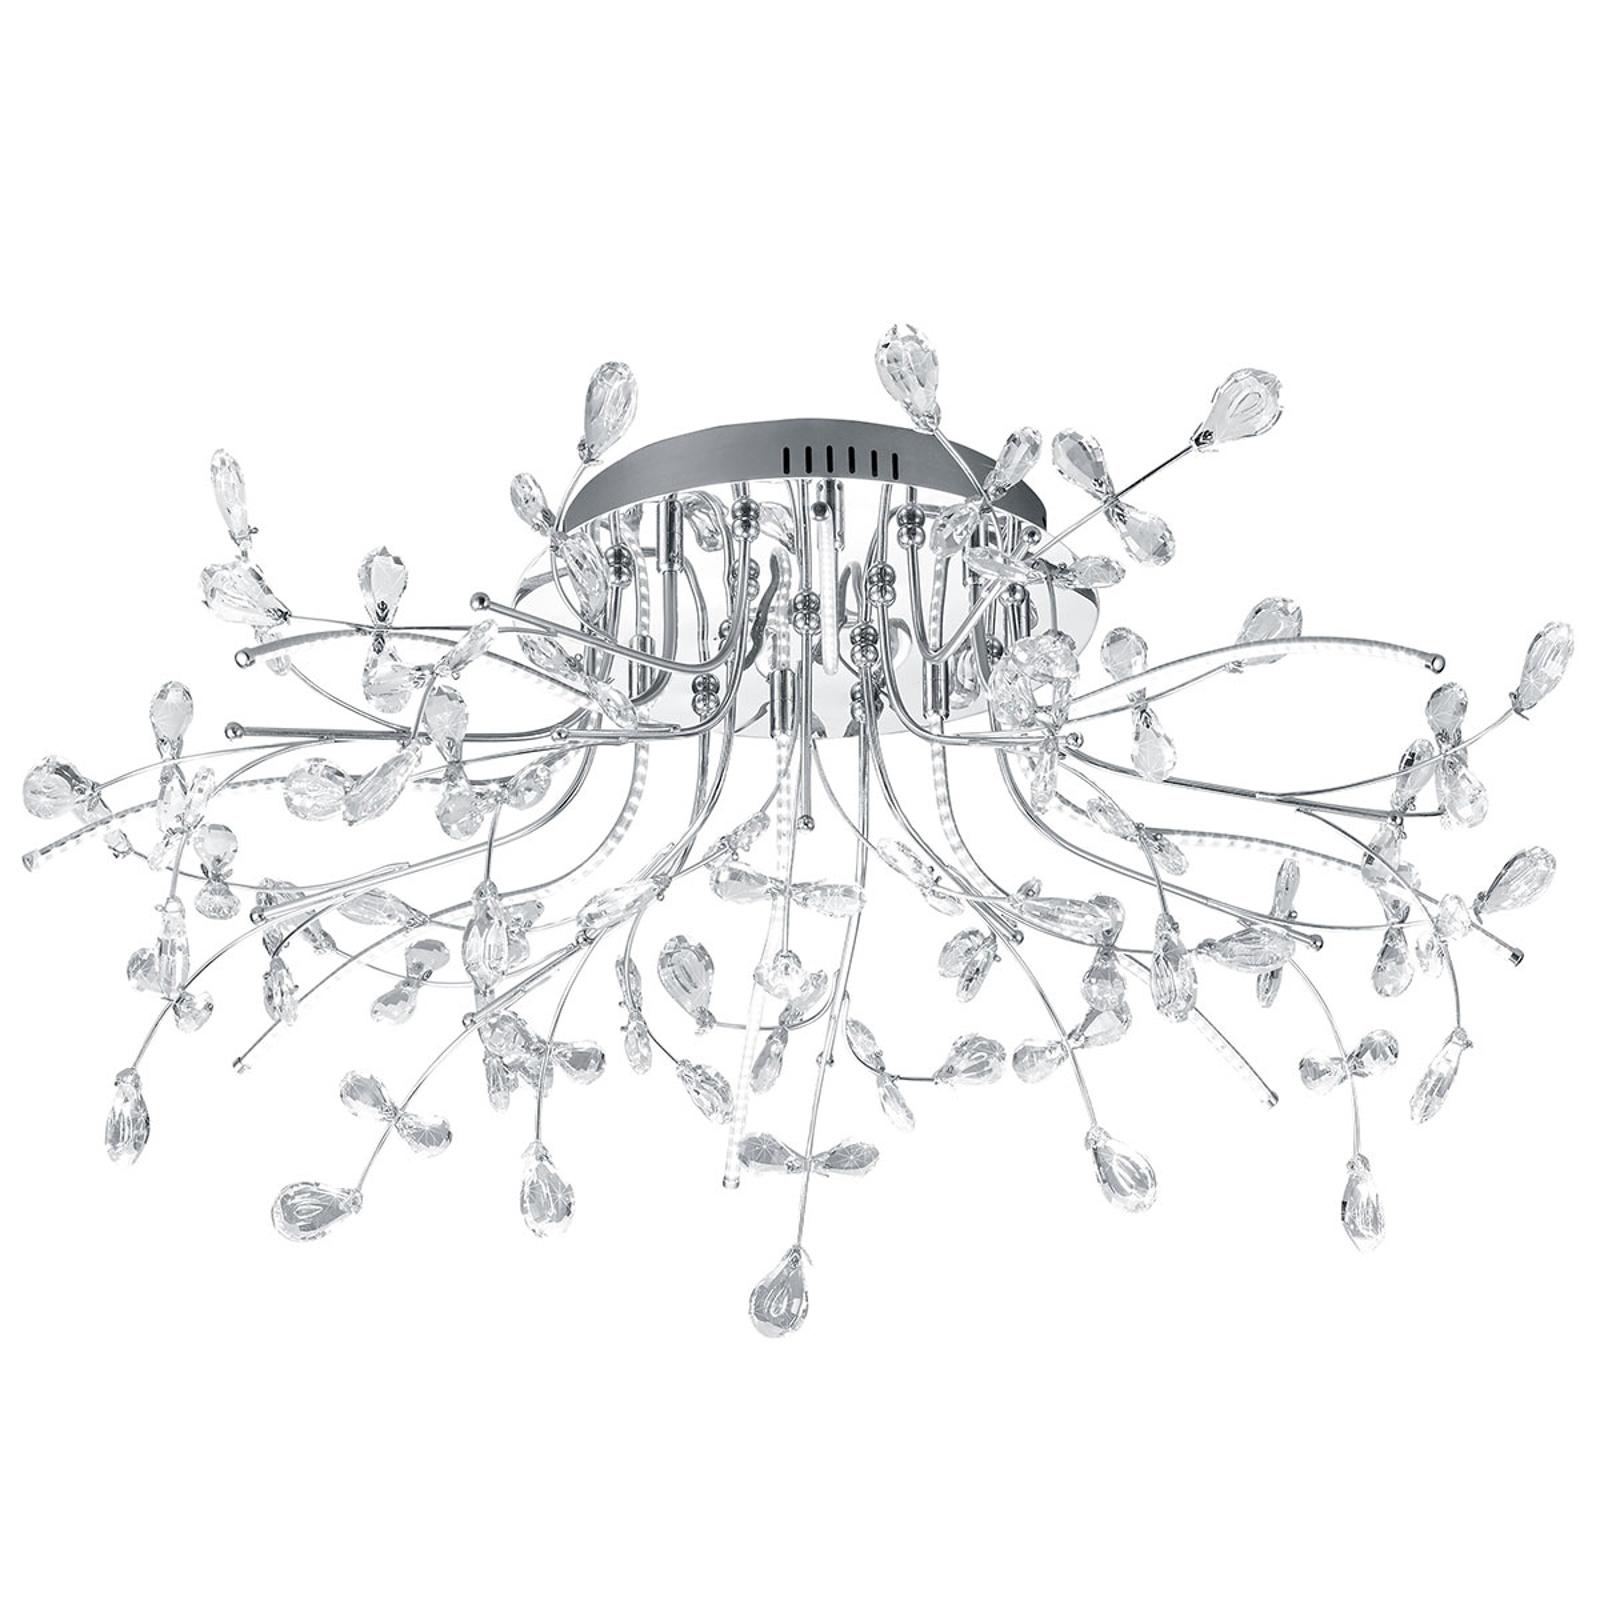 B-Leuchten Crystal lampa sufitowa, chrom, 77 cm